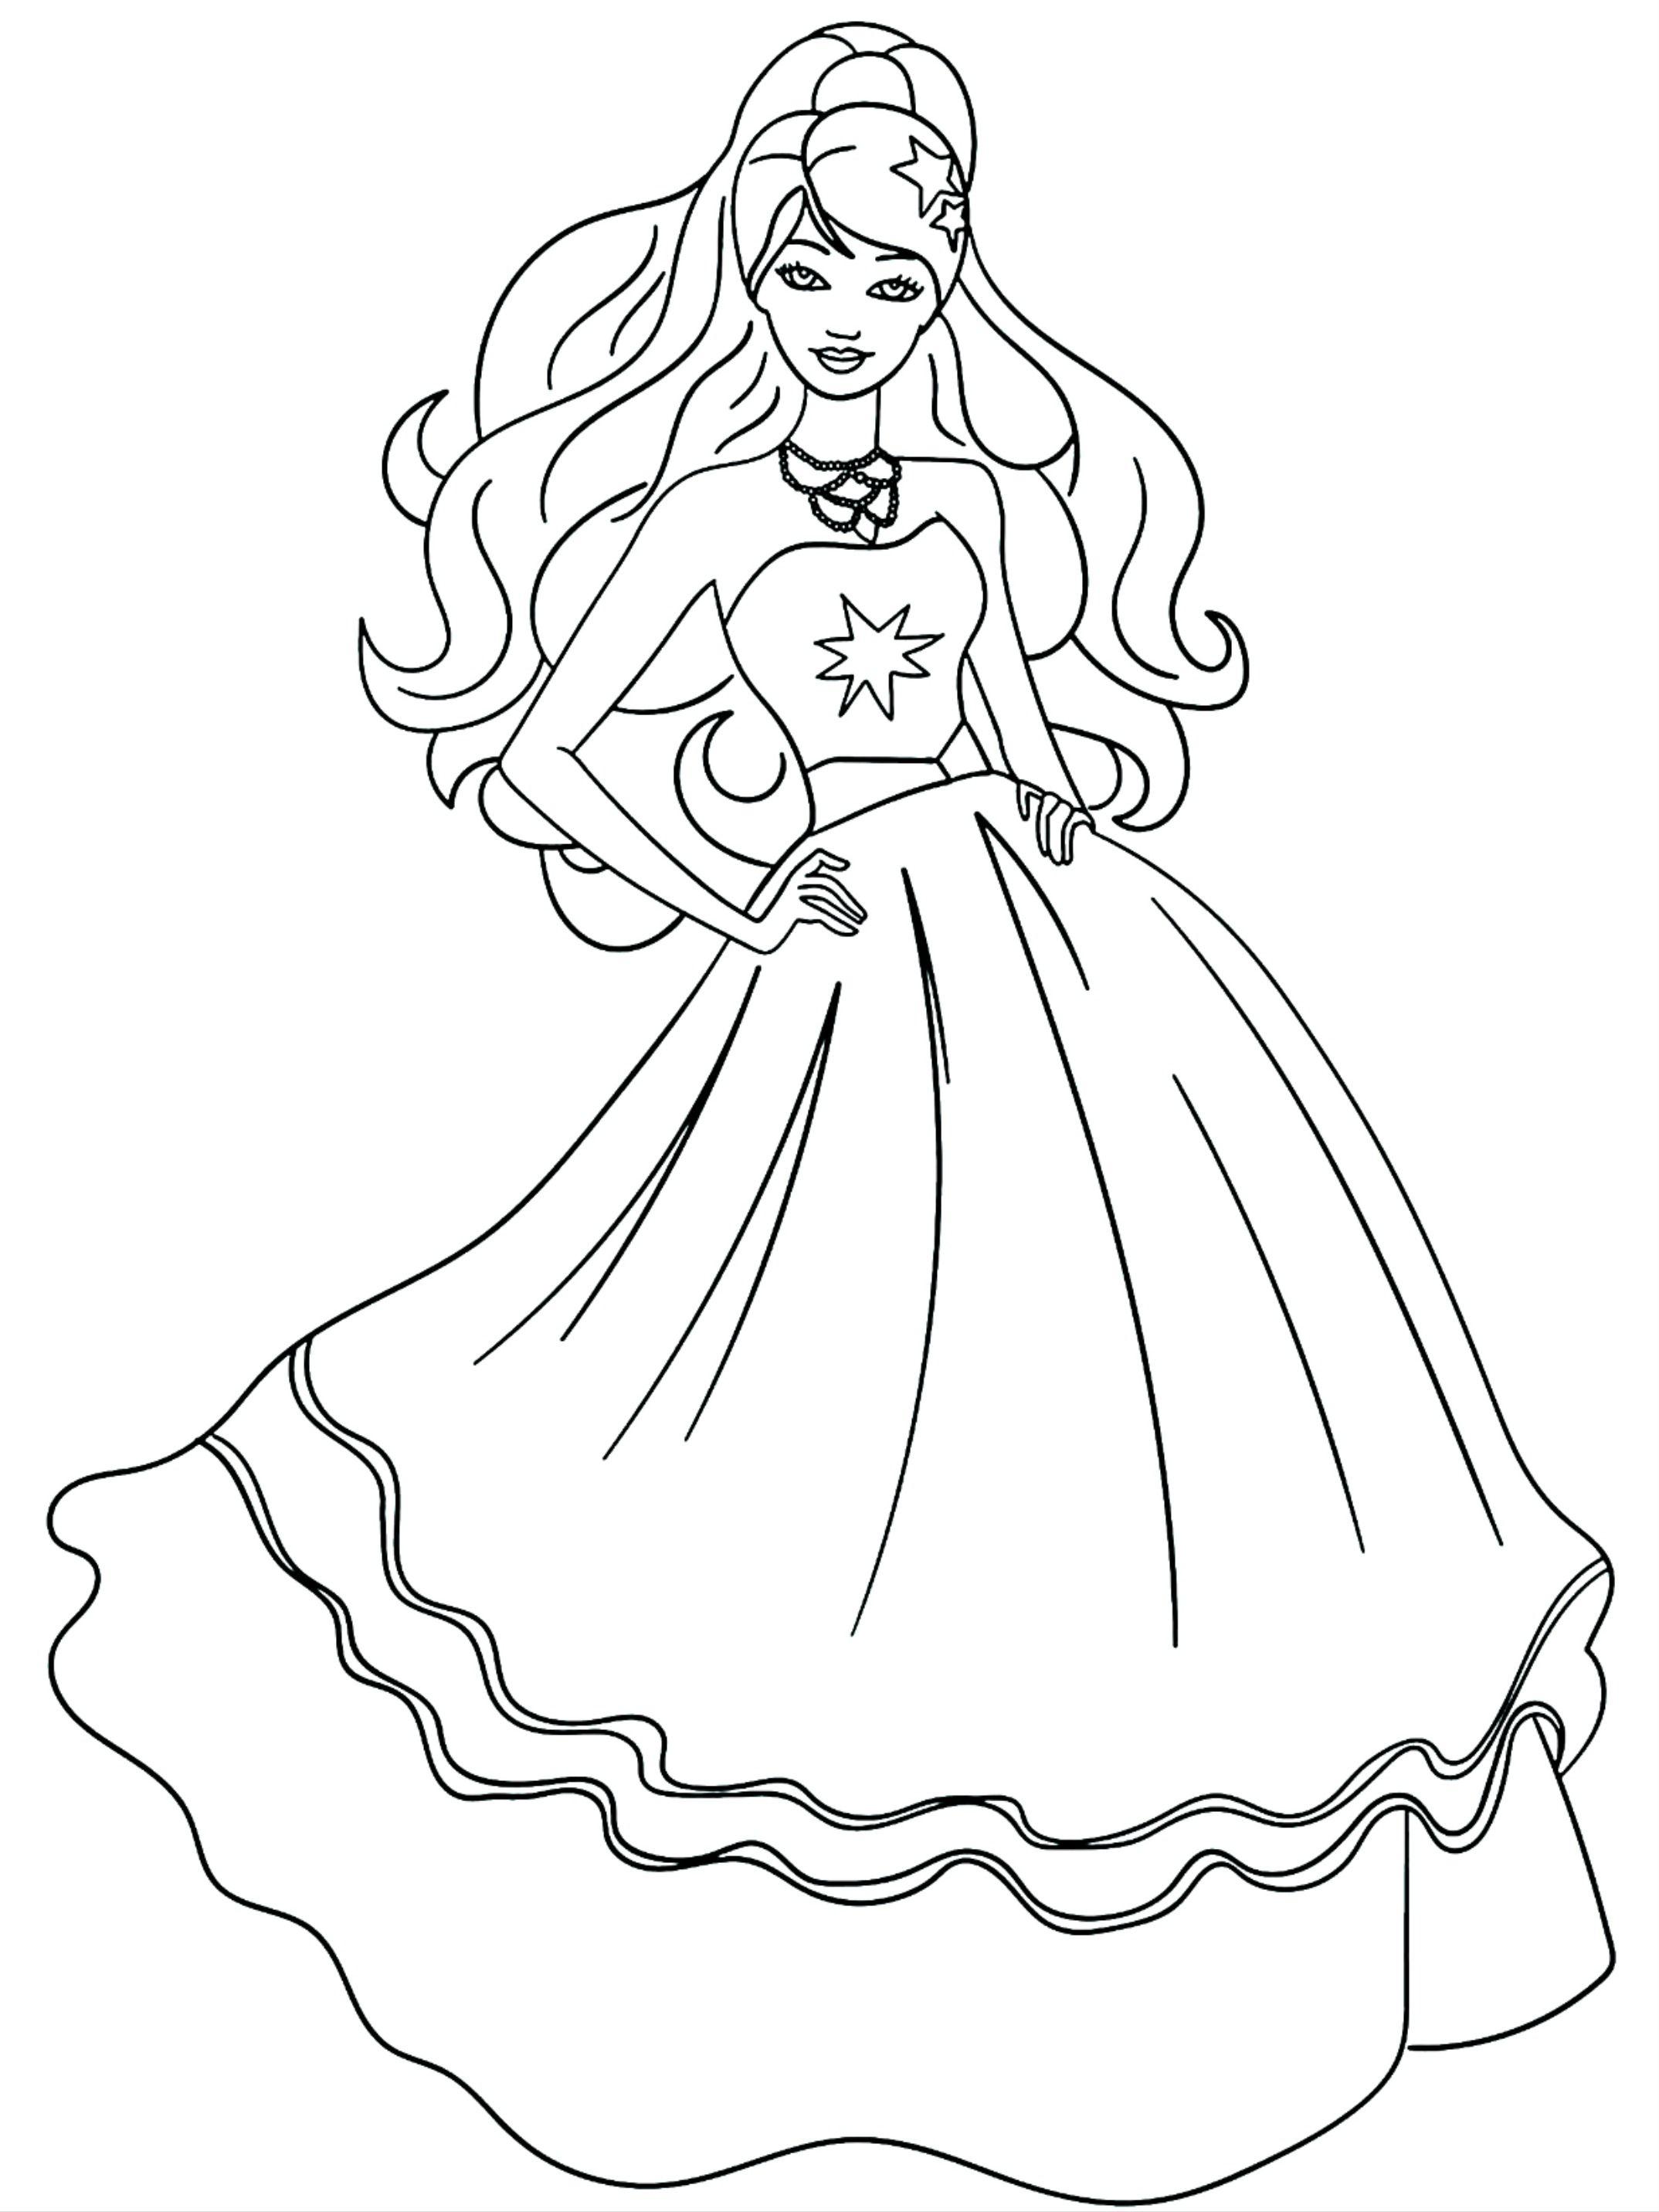 Barbie Princess Coloring Pages For Kids Princess Coloring Pages For Kids Princess Coloring Pages Princess Coloring